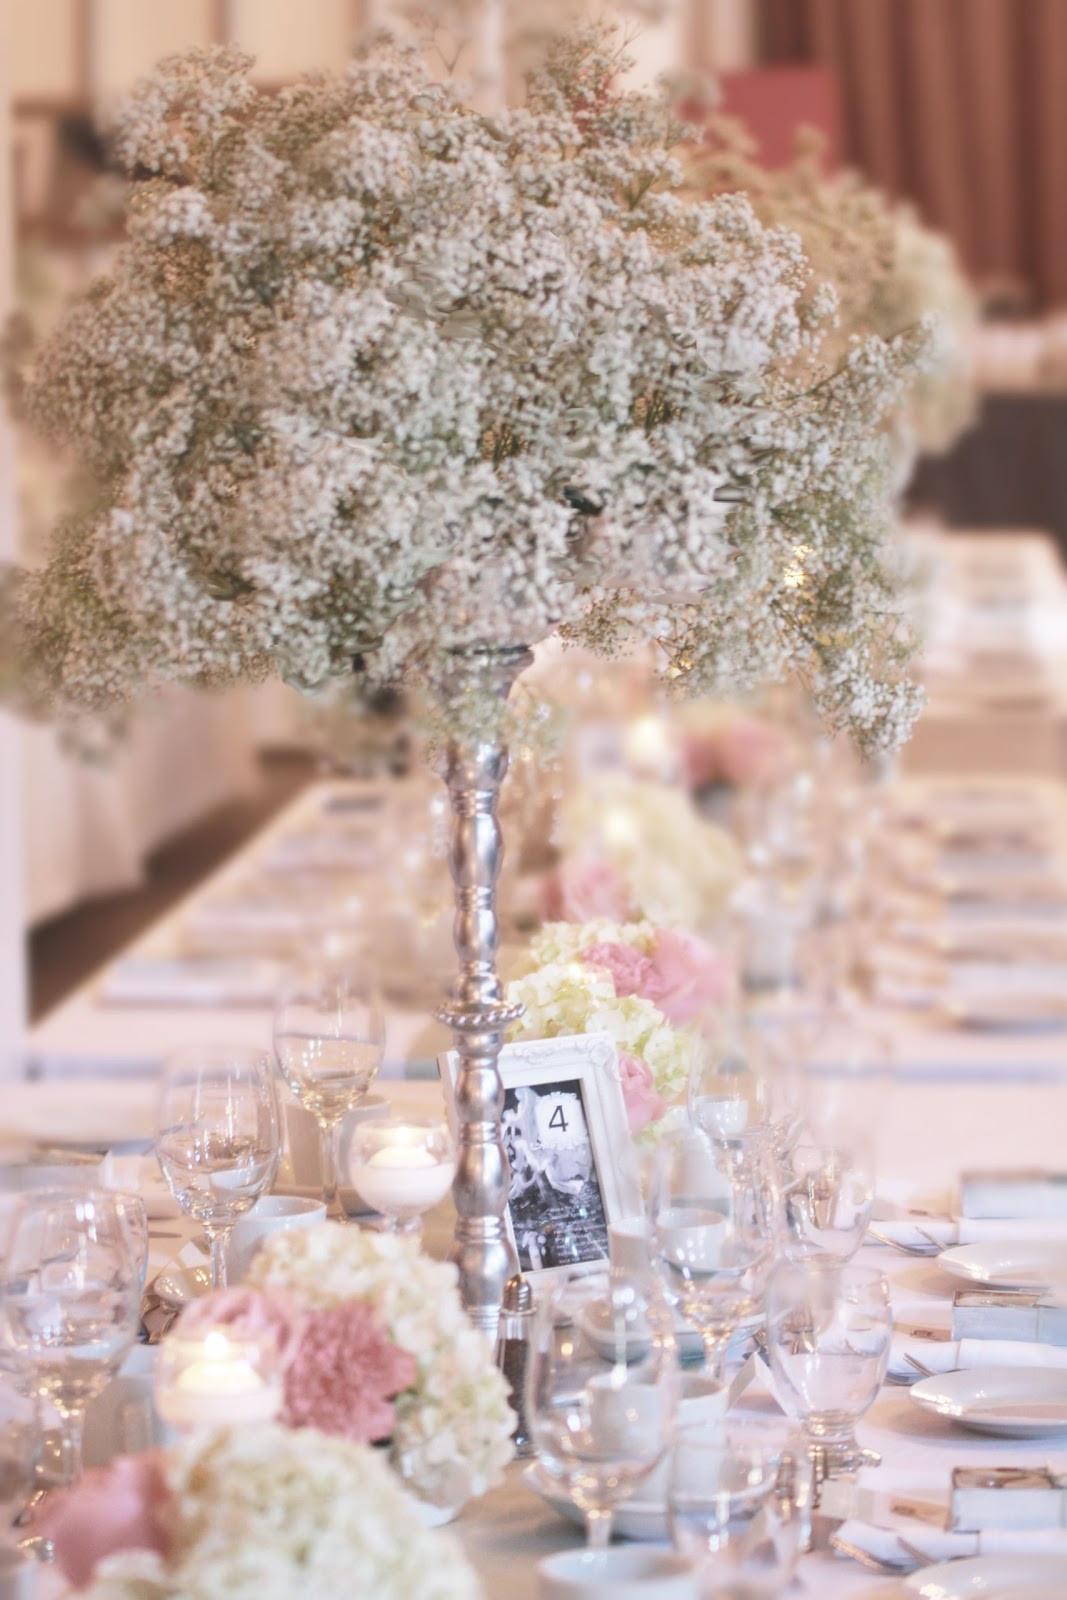 Best ideas about DIY Centerpieces For Wedding . Save or Pin DIY Wedding Centerpieces Now.